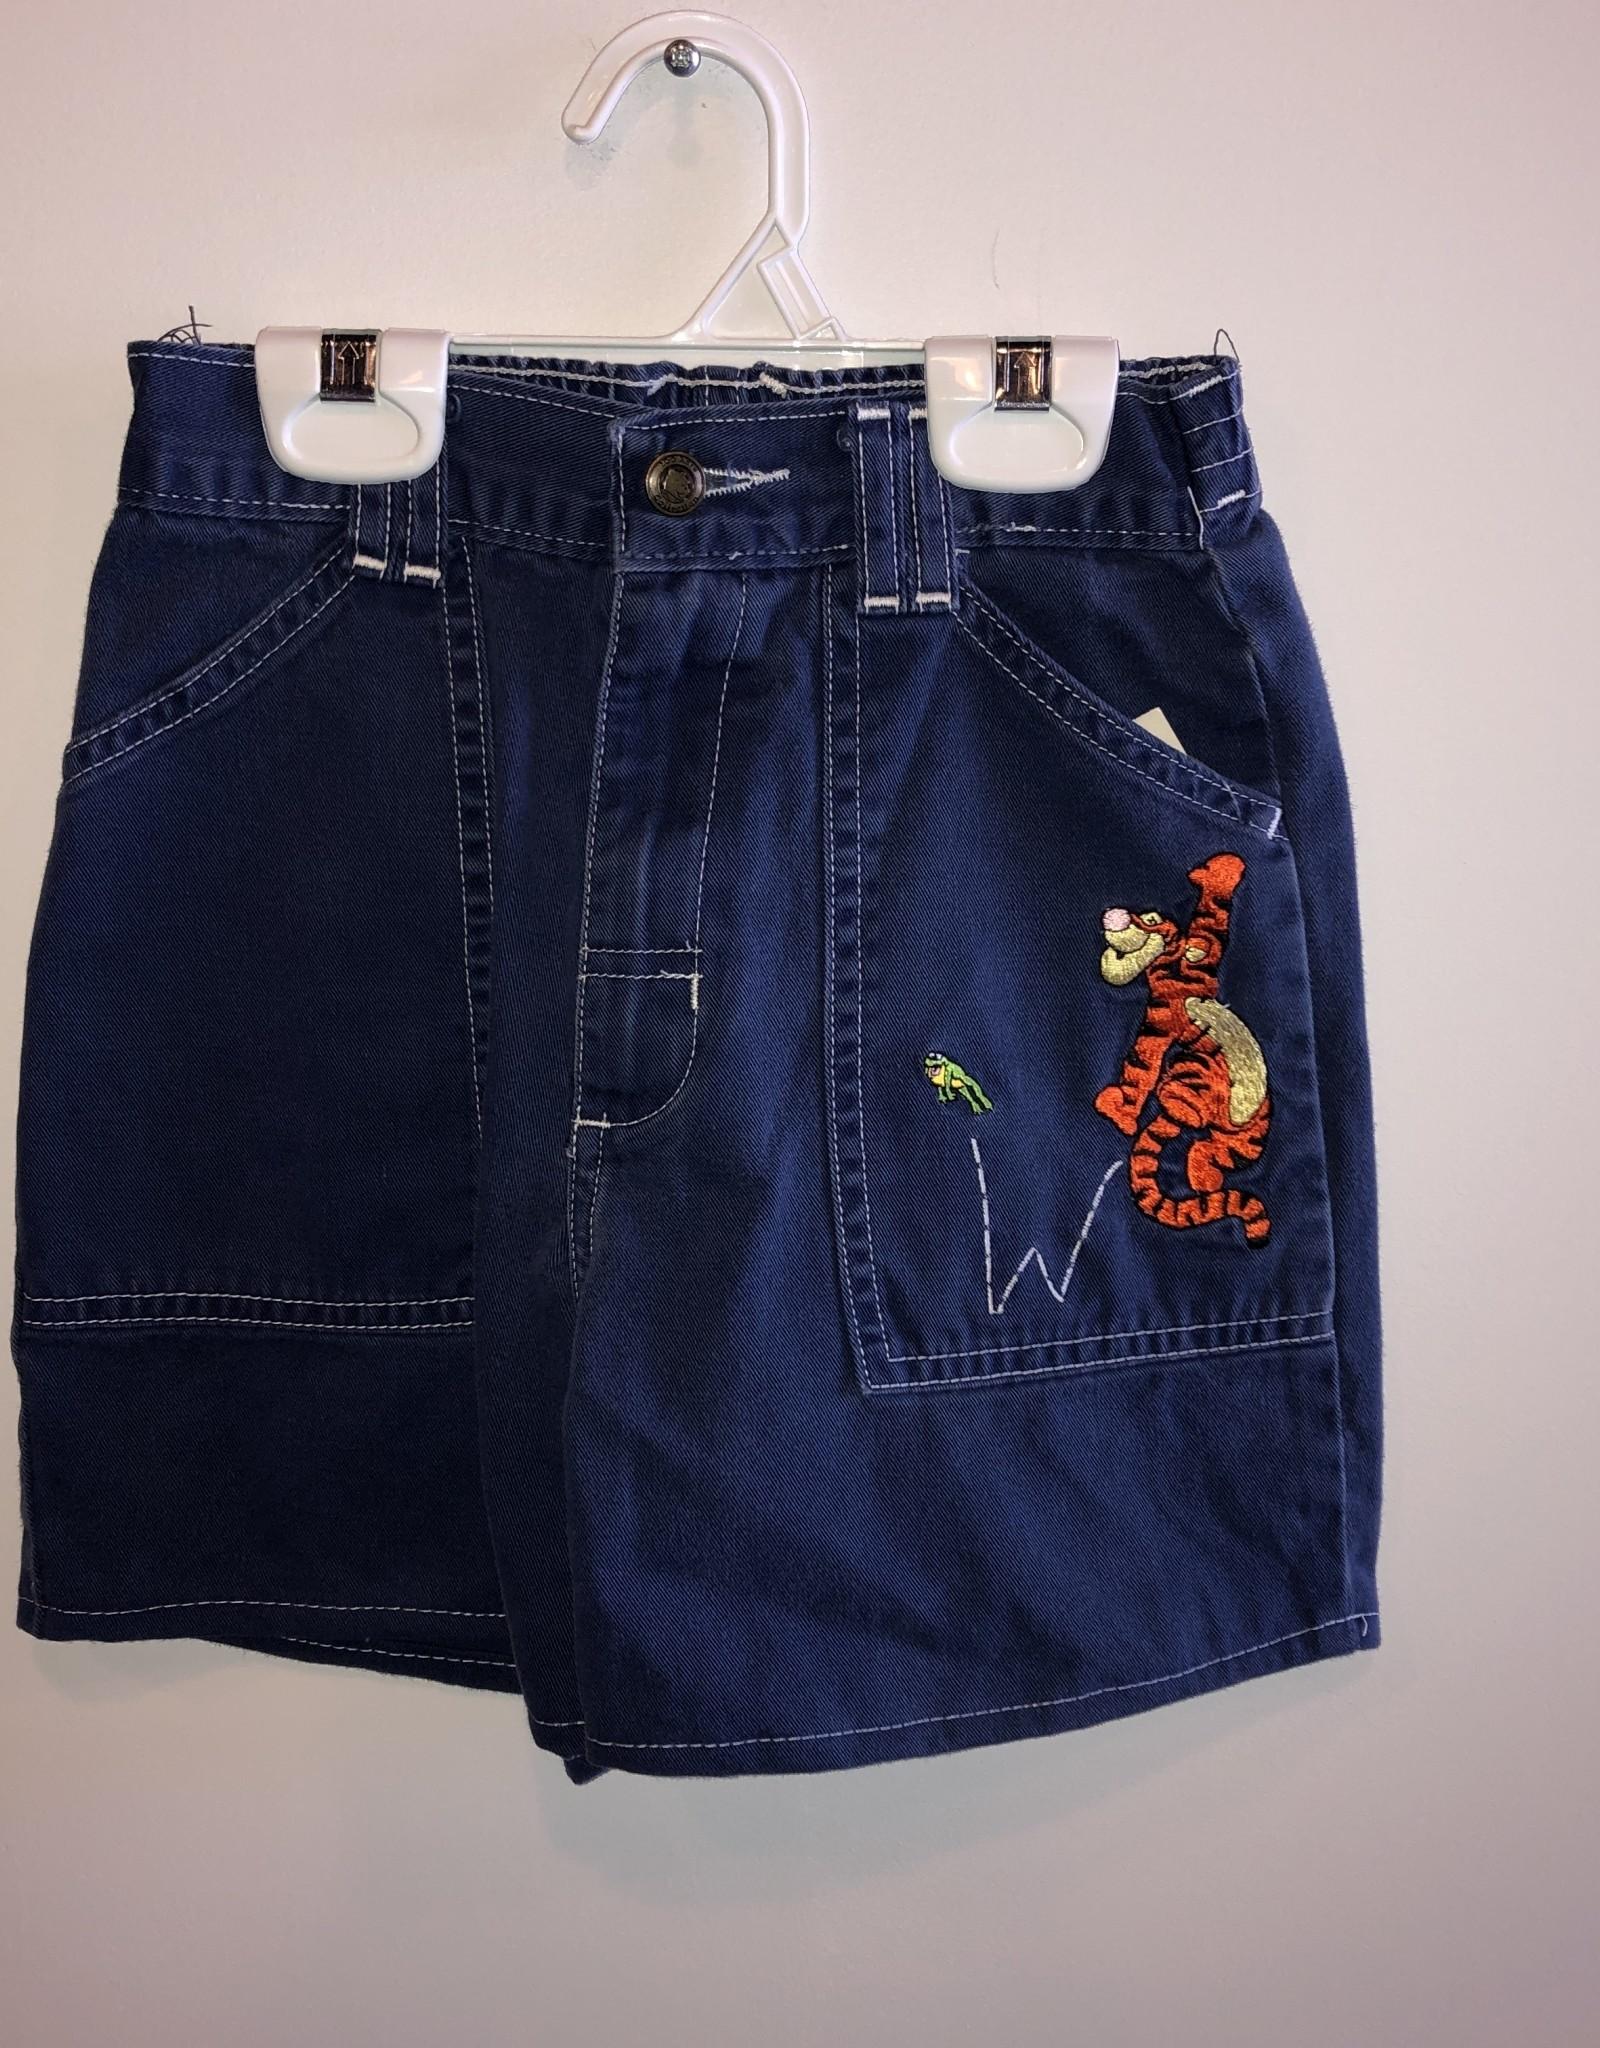 Disney Boys/5T/DIsney/Shorts